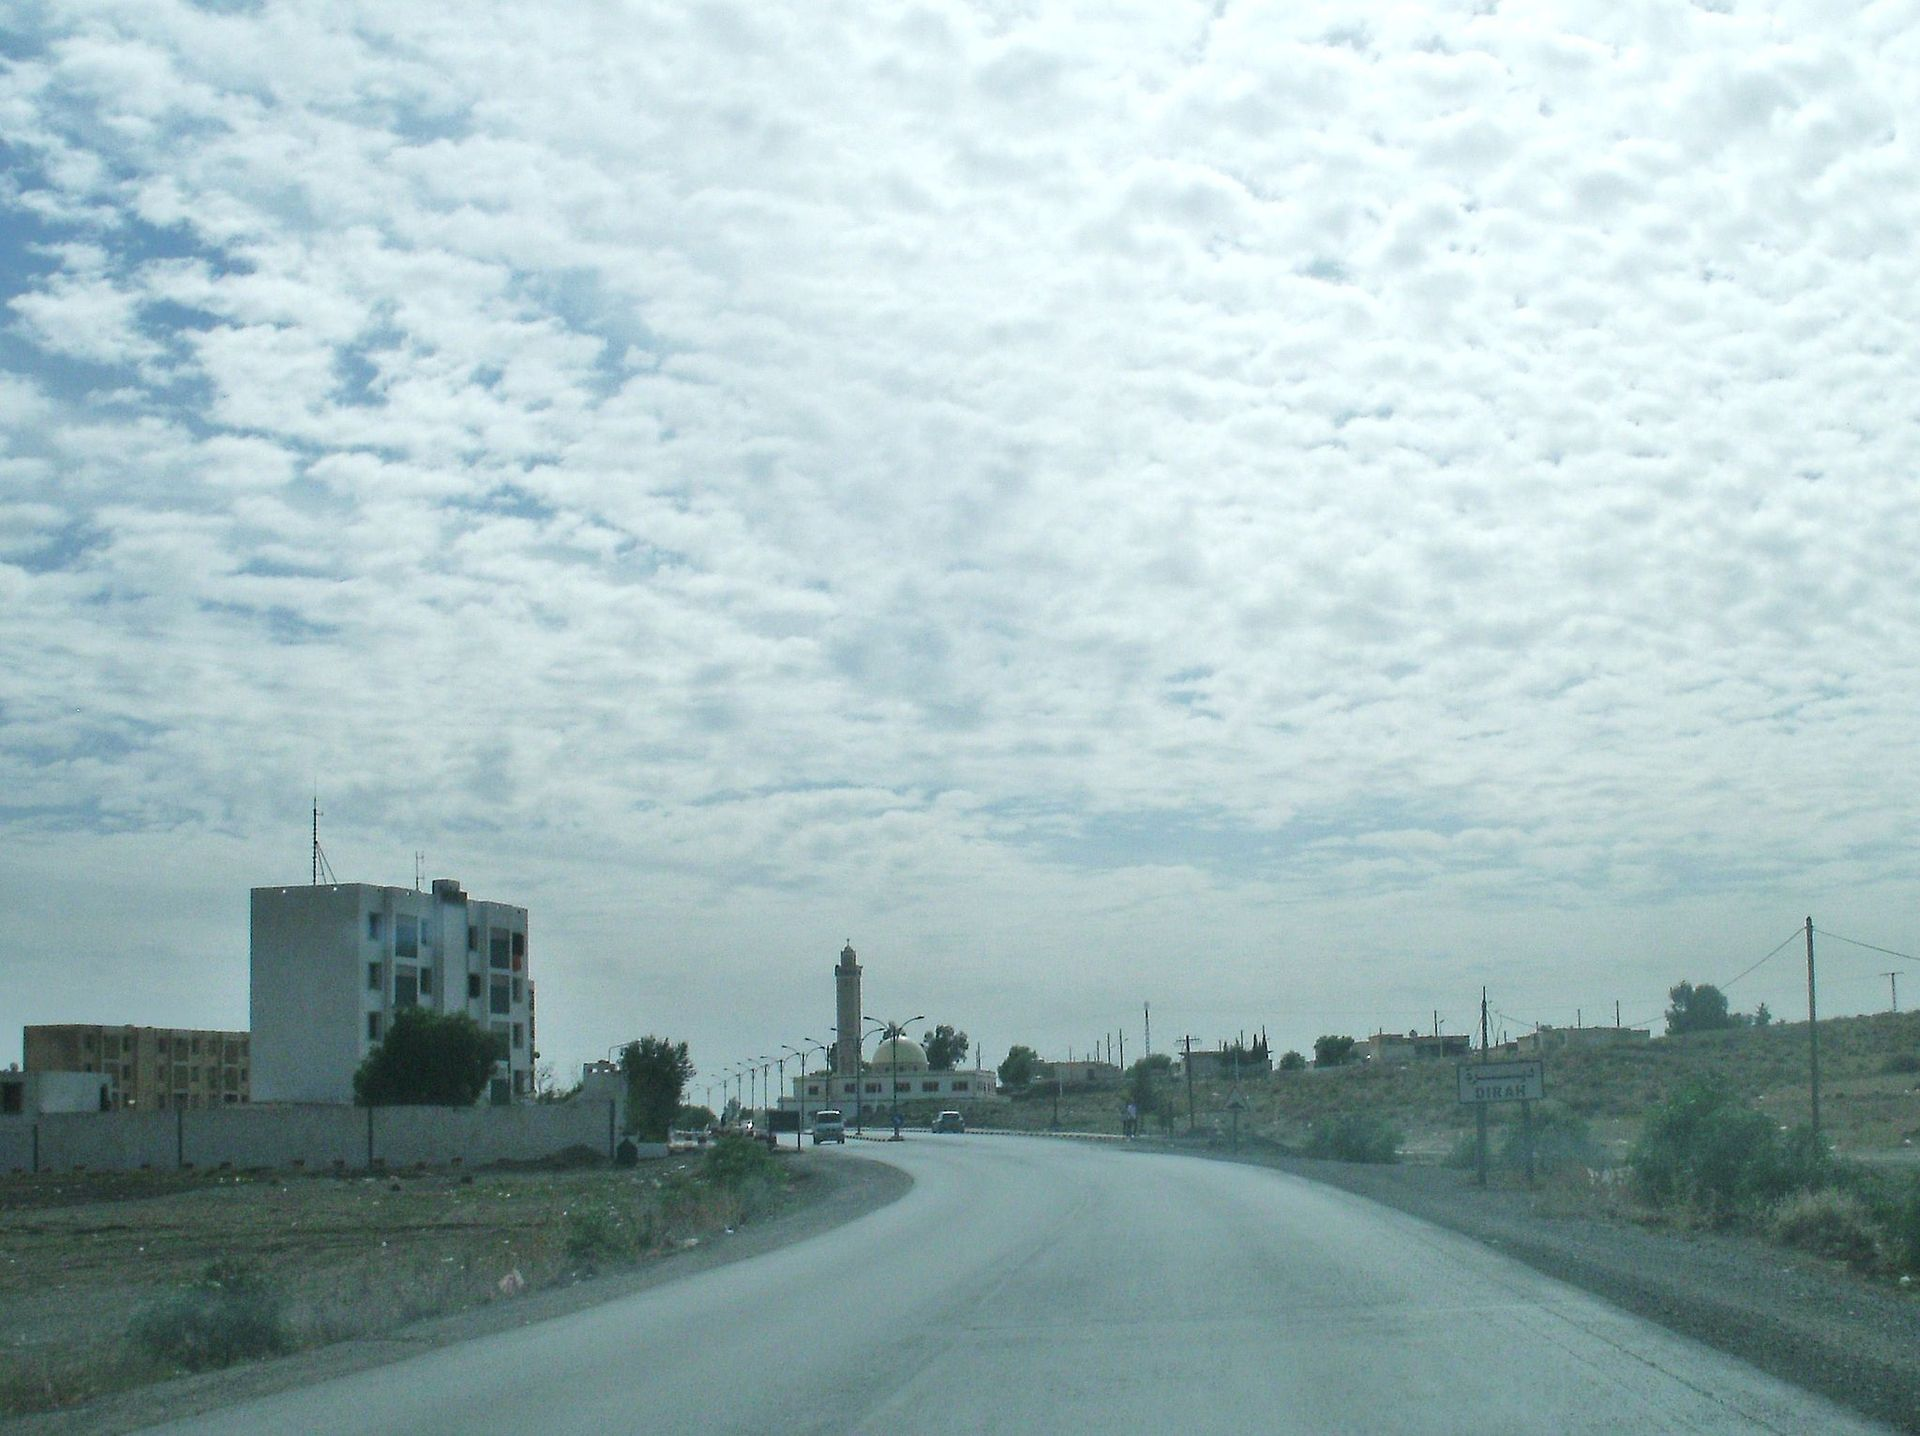 Mtb Riviera Berica Strada Dei Vini Berici in addition Px Dirah C Bouira Province Algeria also Tipos De Nariz together with A Acf Cb C Abbdaaac A A Emv in addition Maxresdefault. on a